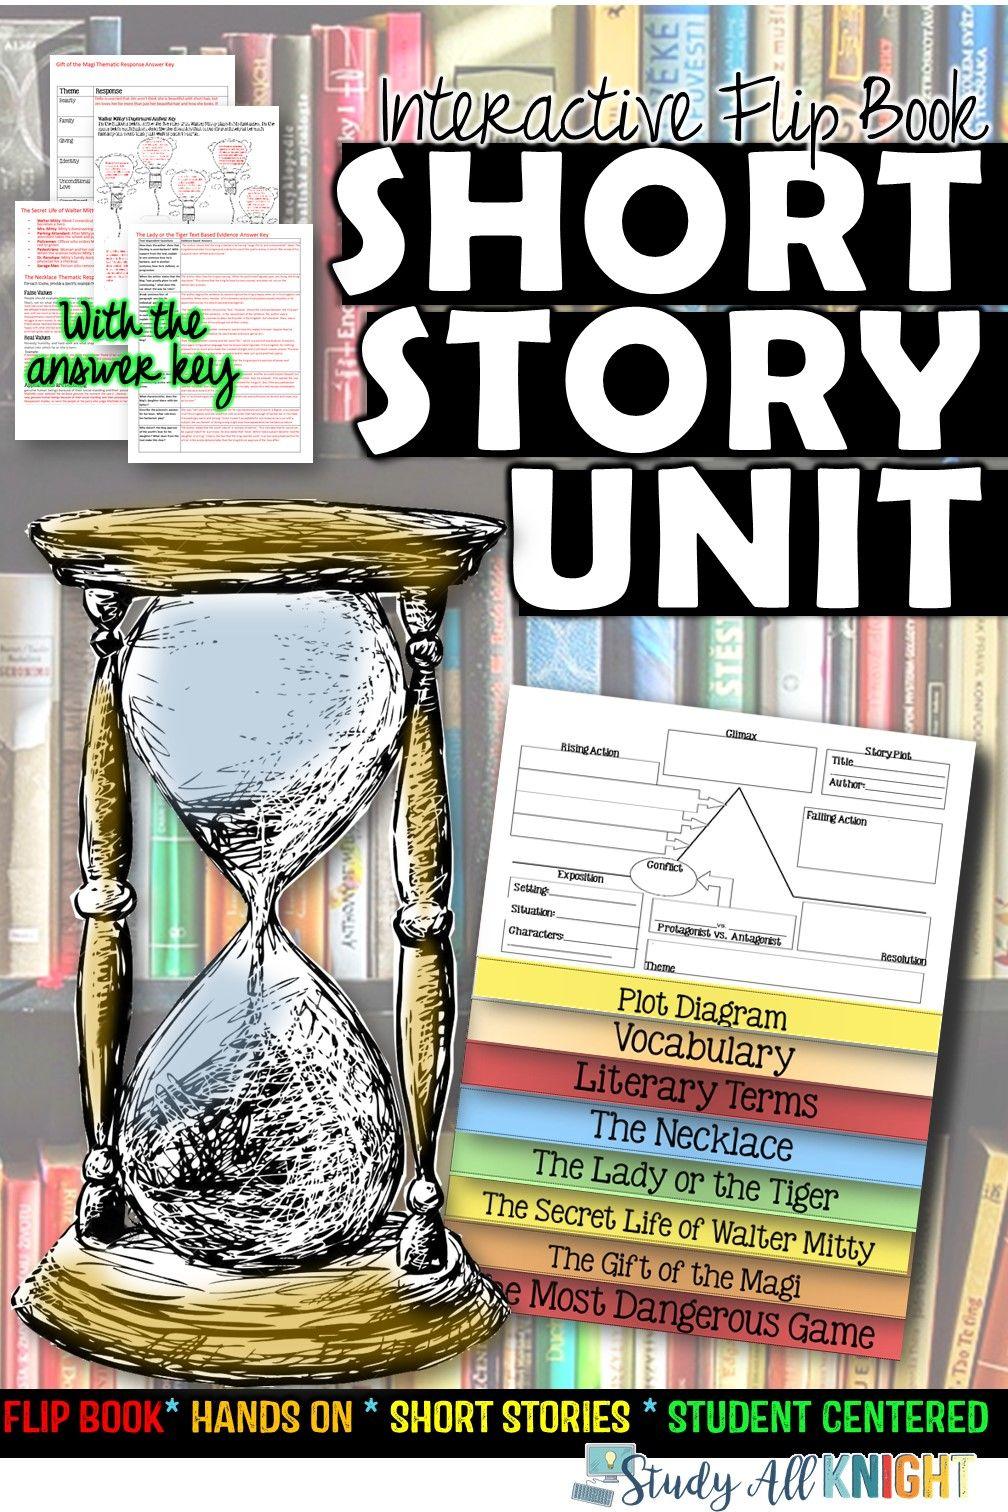 SHORT STORY UNIT LITERATURE GUIDE FLIP BOOK | Short ...